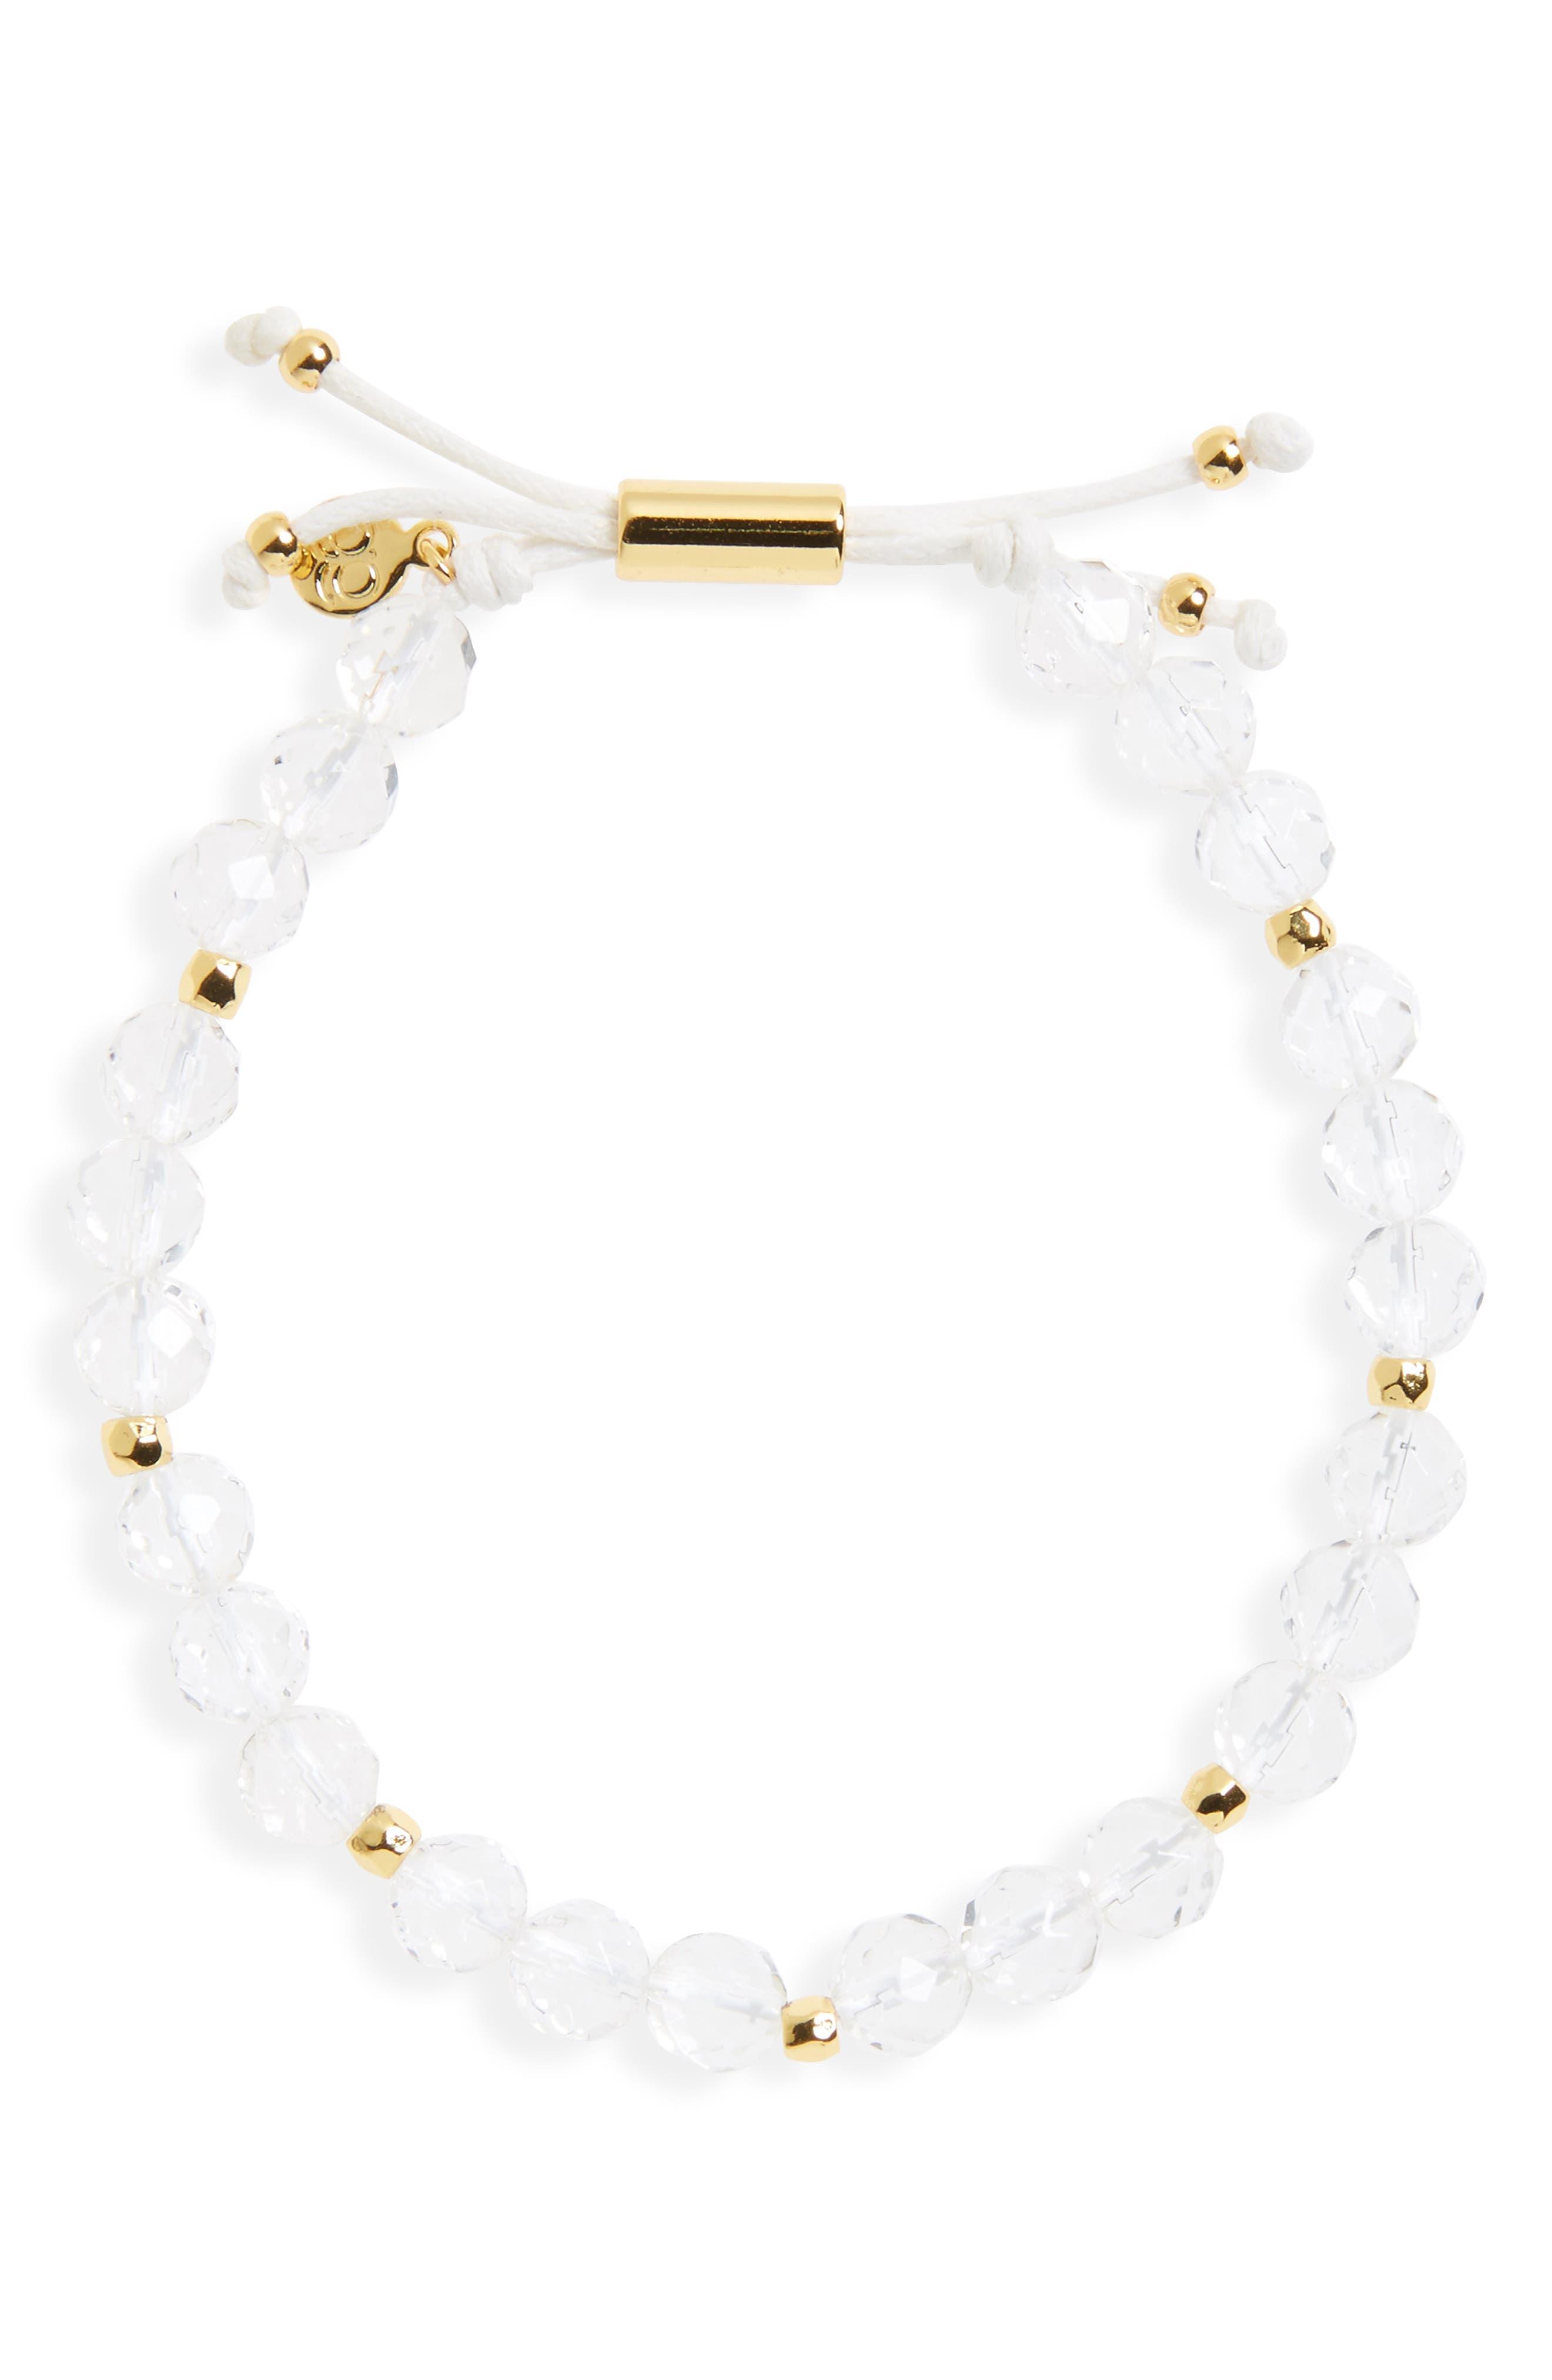 Main Image - gorjana Power Semiprecious Stone Beaded Bracelet